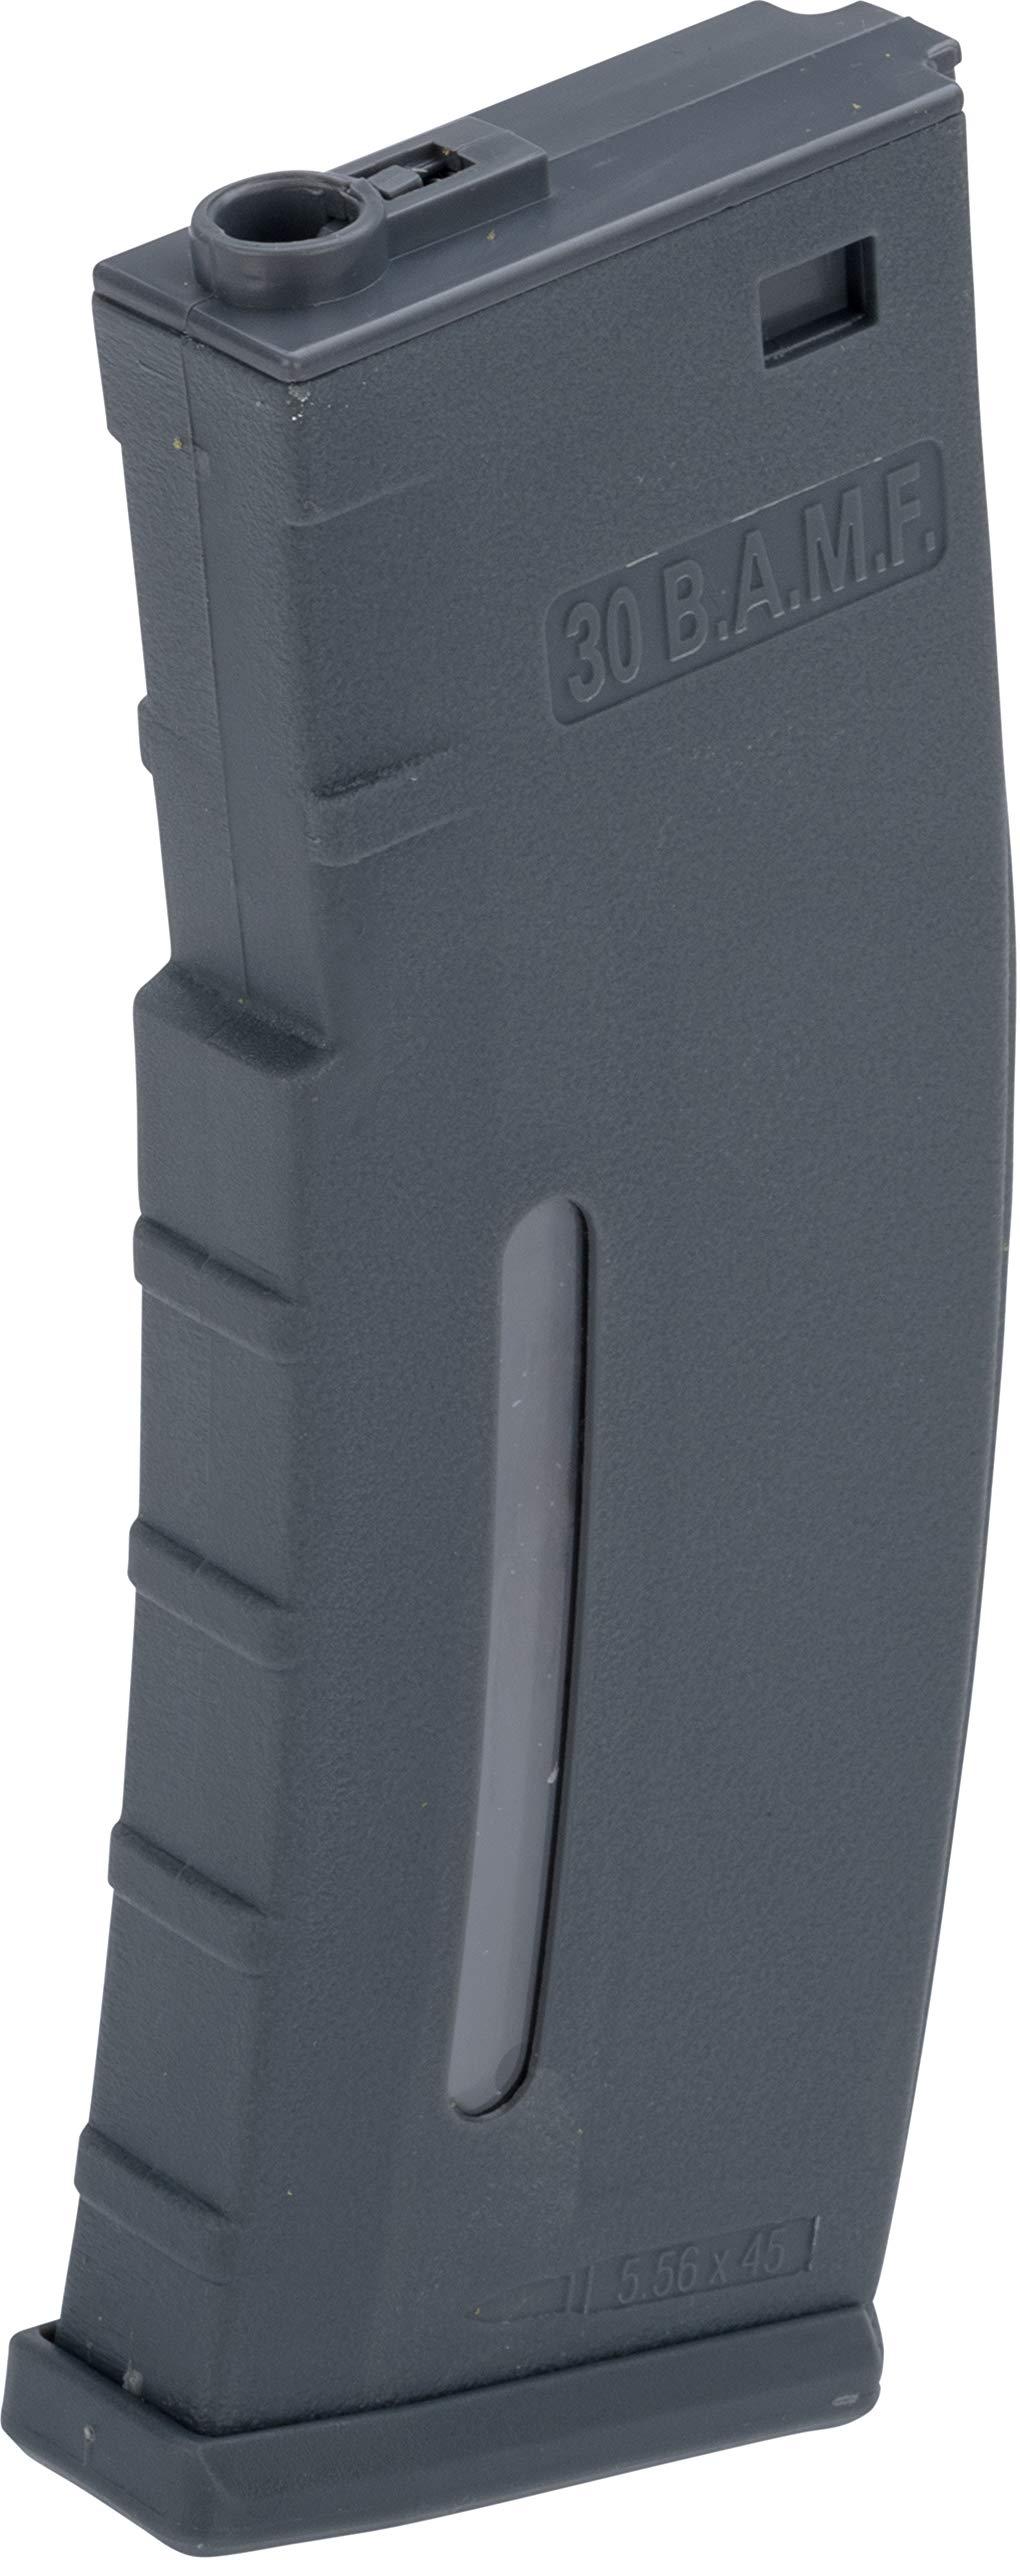 Evike BAMF 30rd Polymer Mil-Sim Airsoft Magazine for M4 / M16 Series AEG Rifles (Color: Gray / x1 Single Mag) by Evike